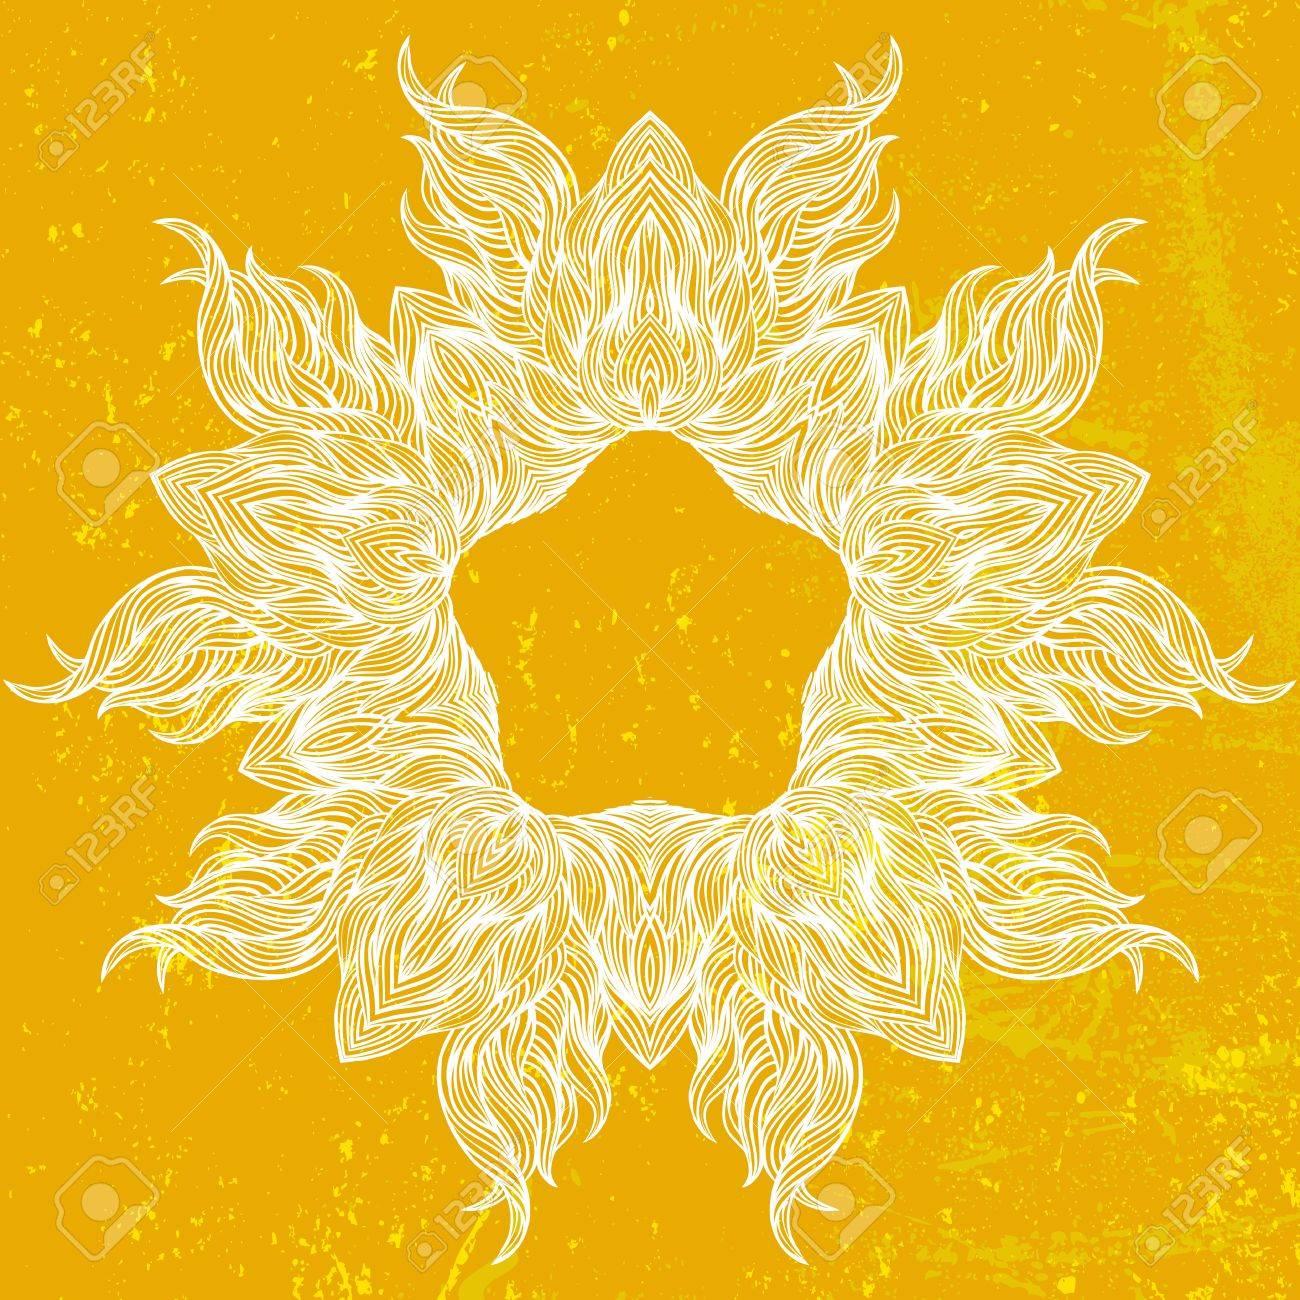 Ornamental mandala drawn in thin lines Stock Photo - 20862941